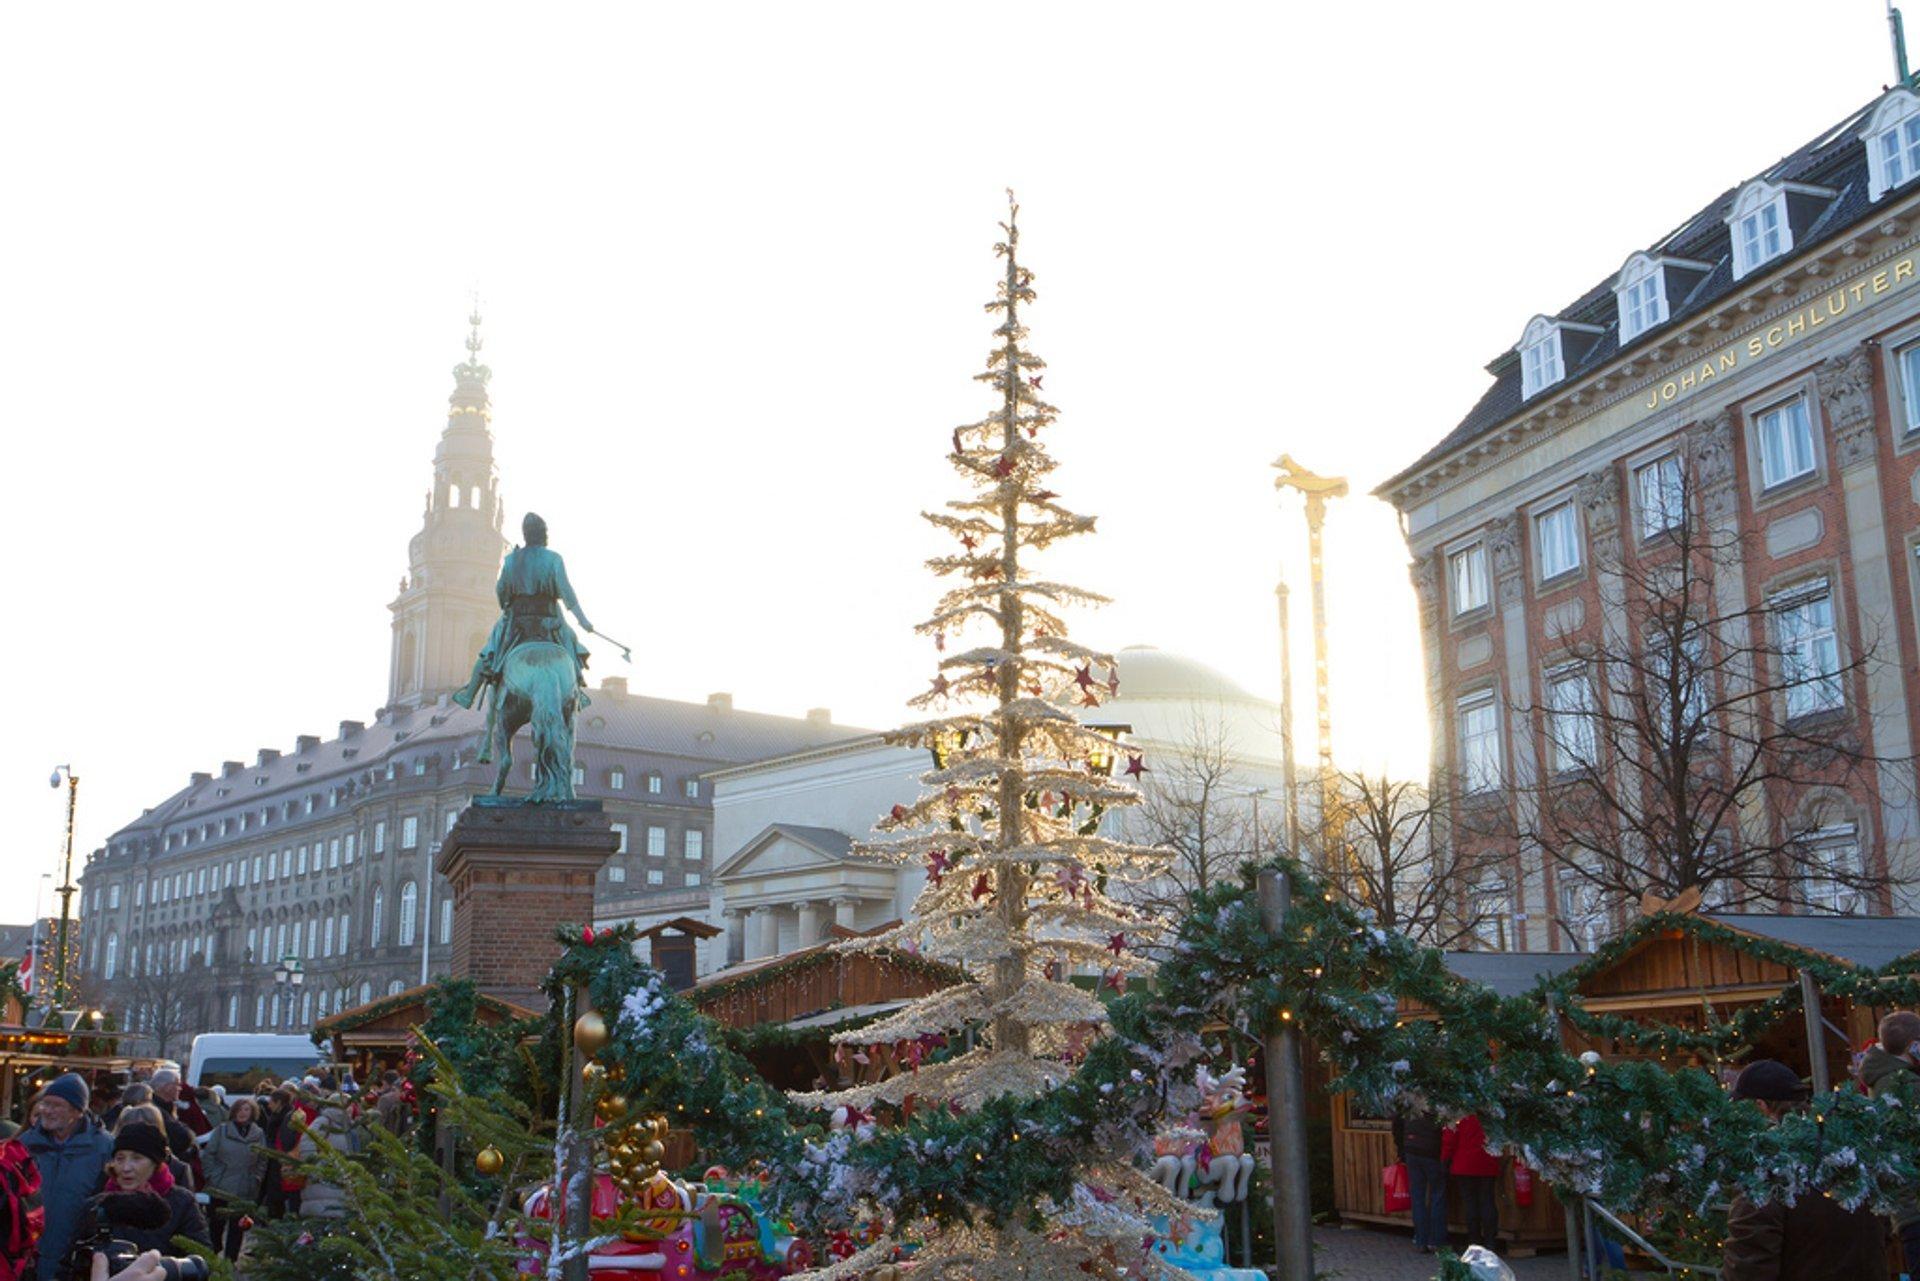 Julemarked on Højbro Plads, Copenhagen 2020